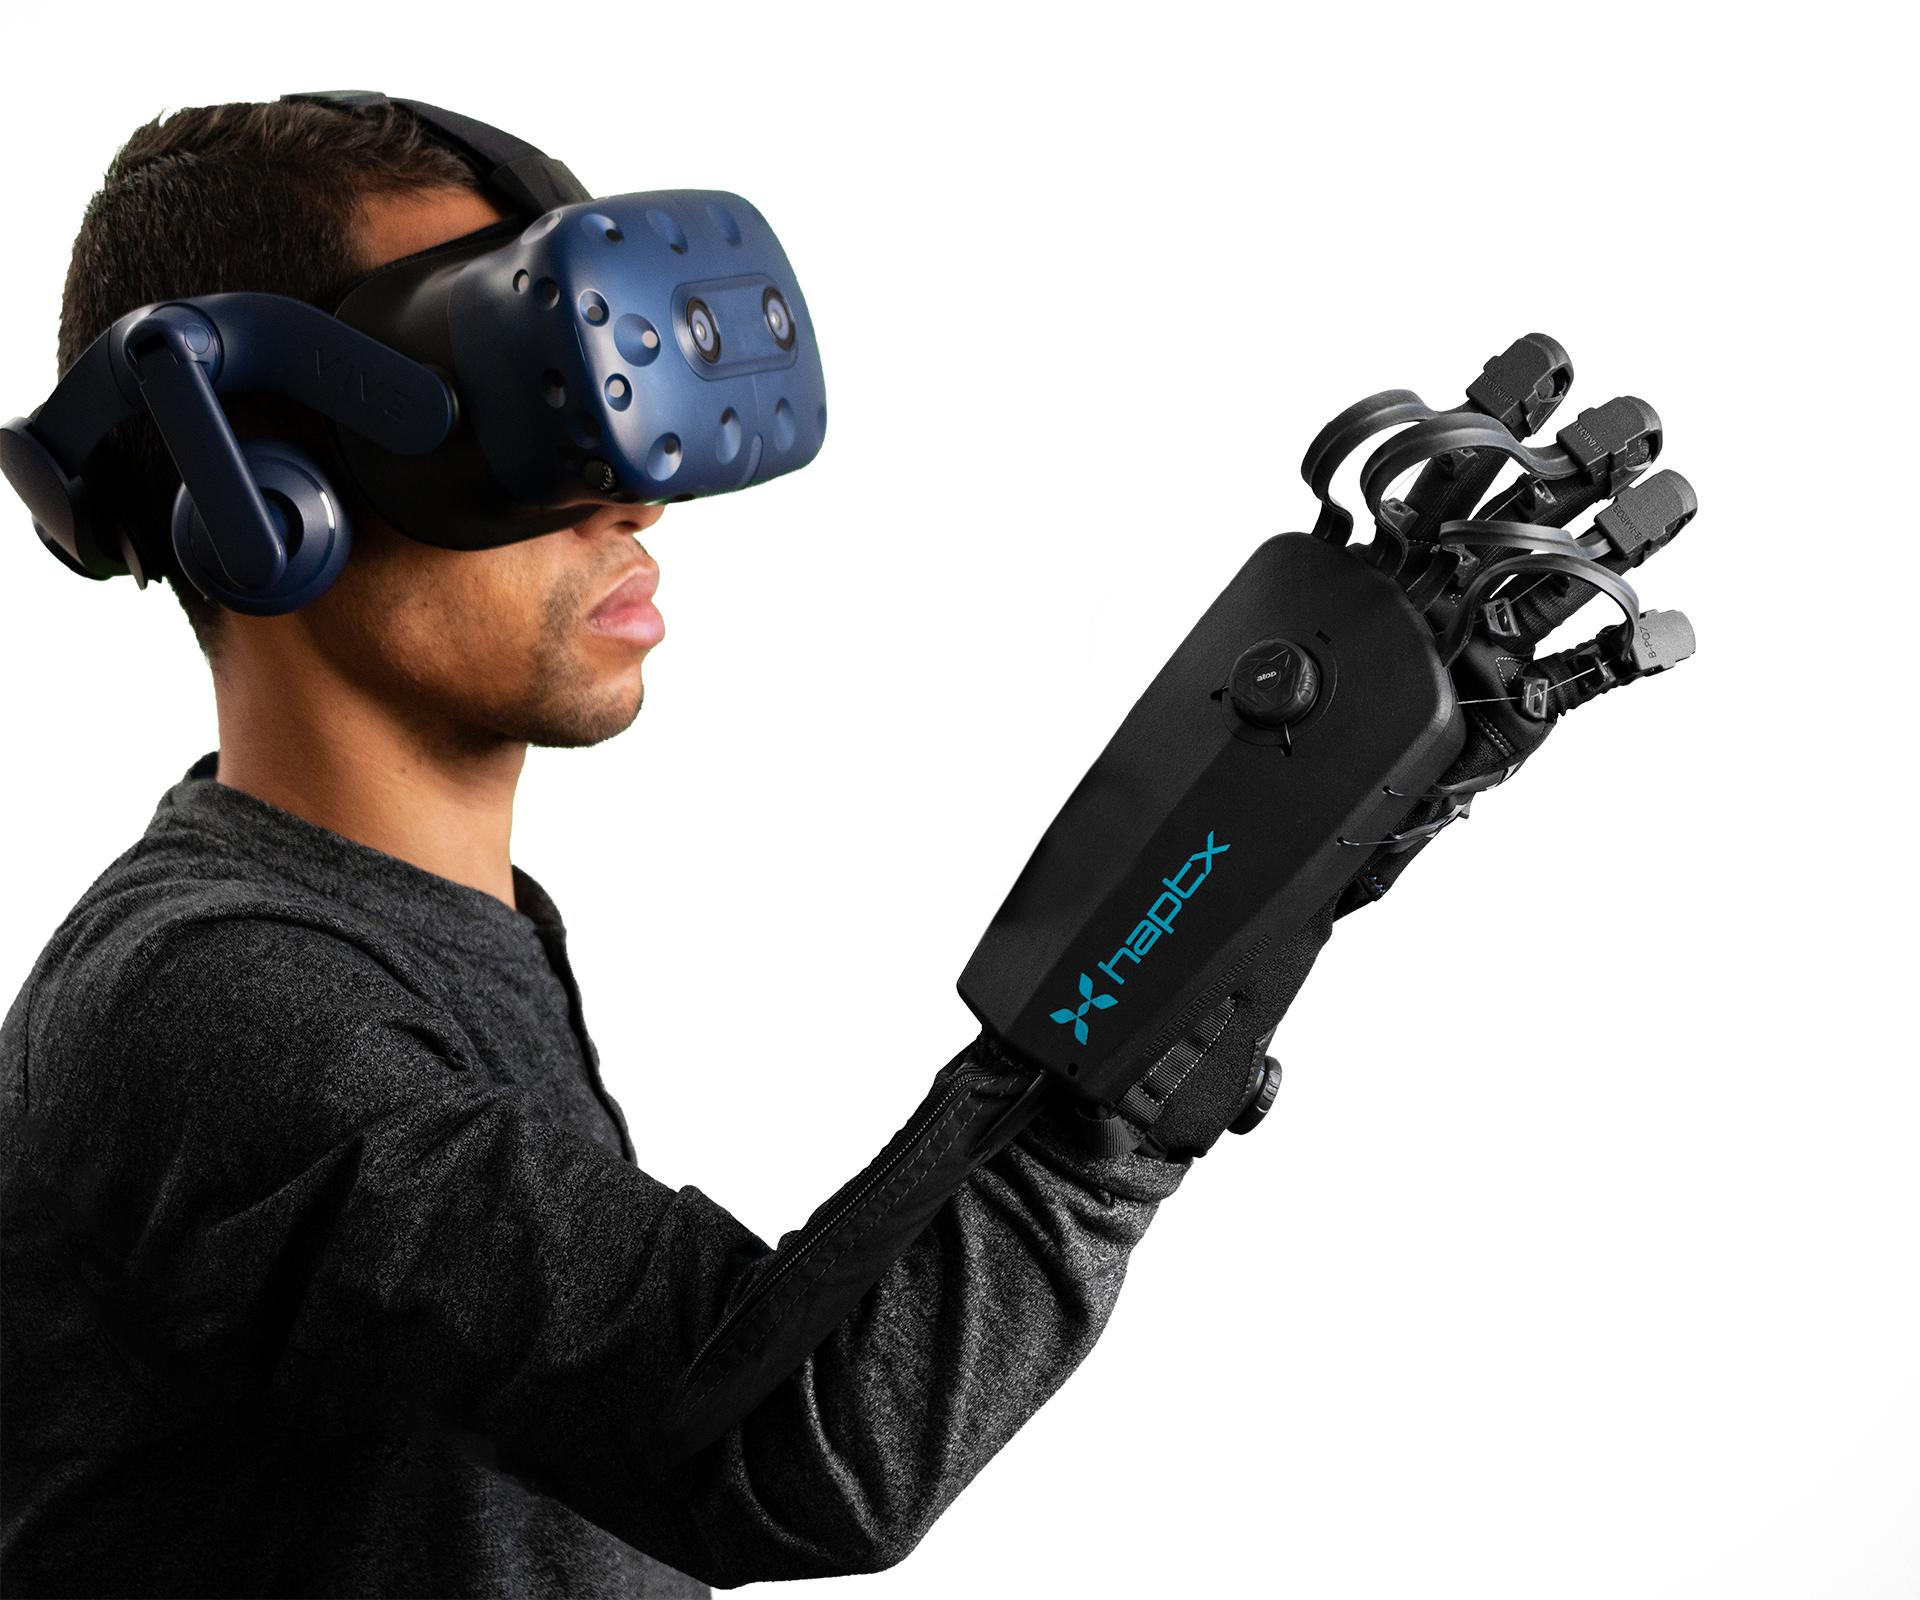 HaptX launches HaptX Gloves DK2 to bring true-contact haptics to VR and robotics